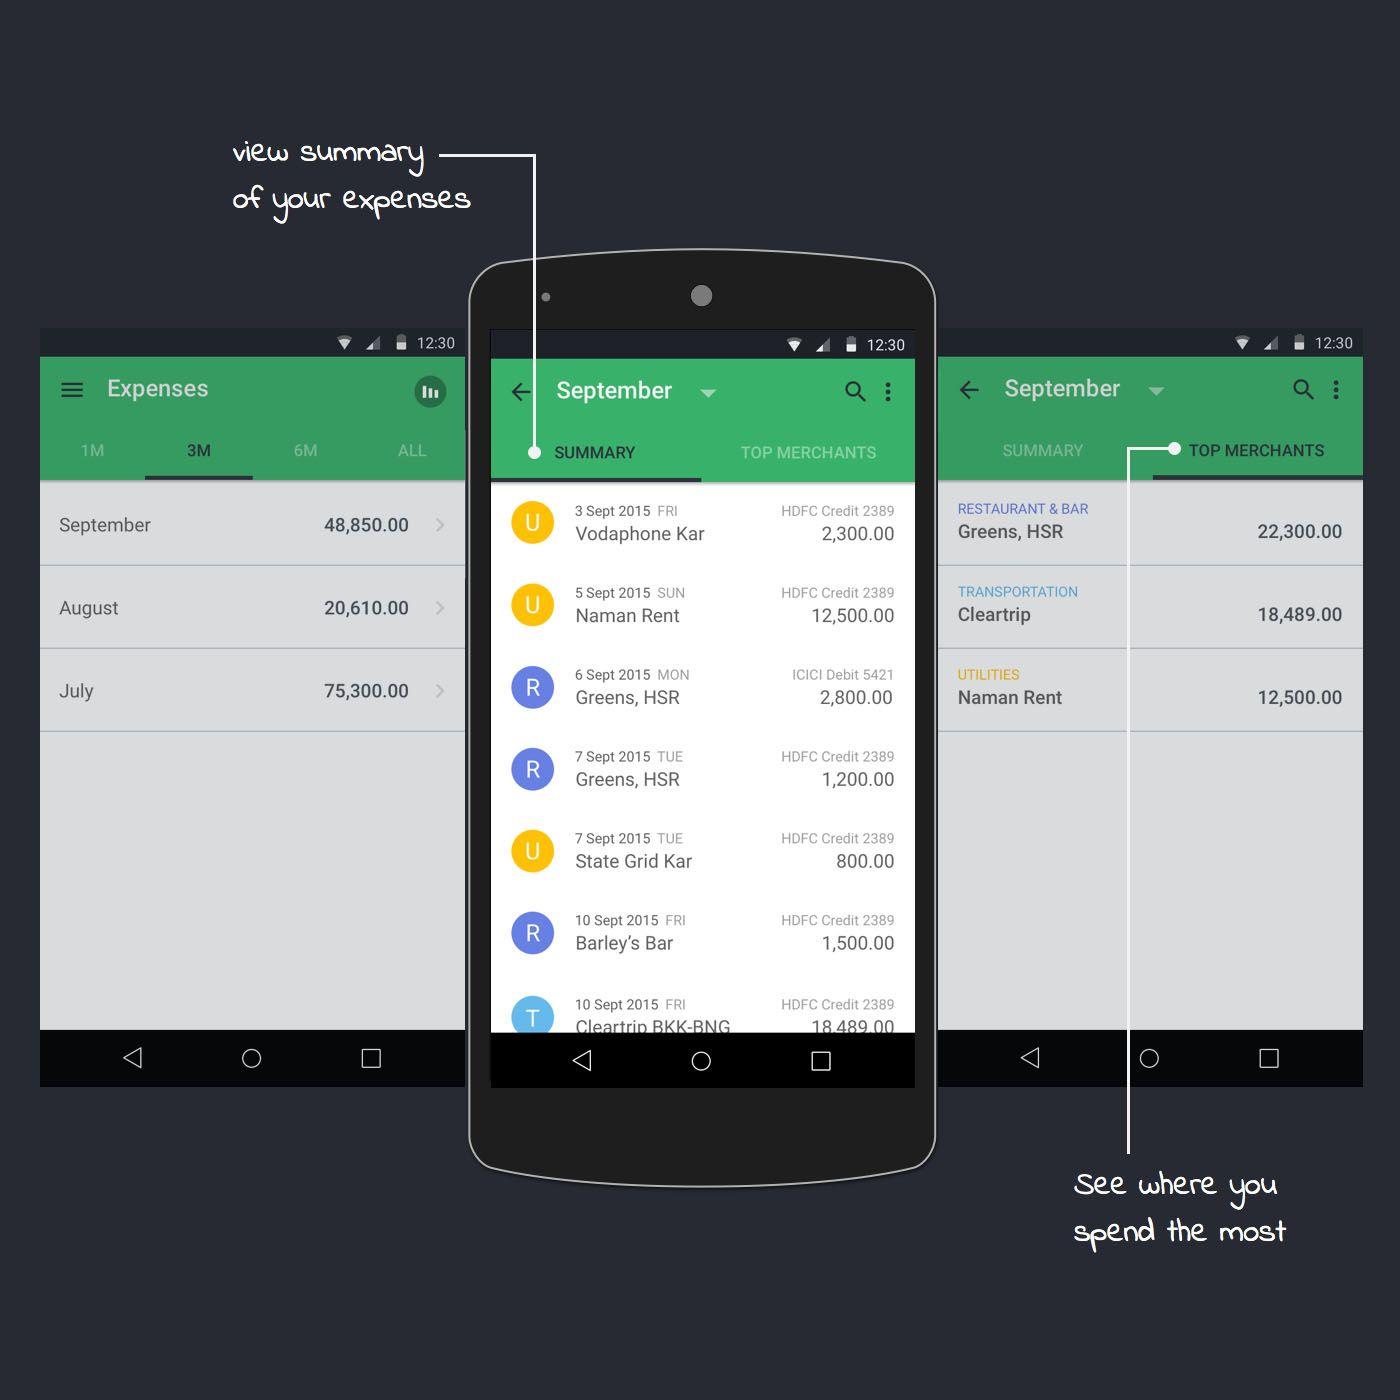 expense tracker app planner wallet savingmoney money cash